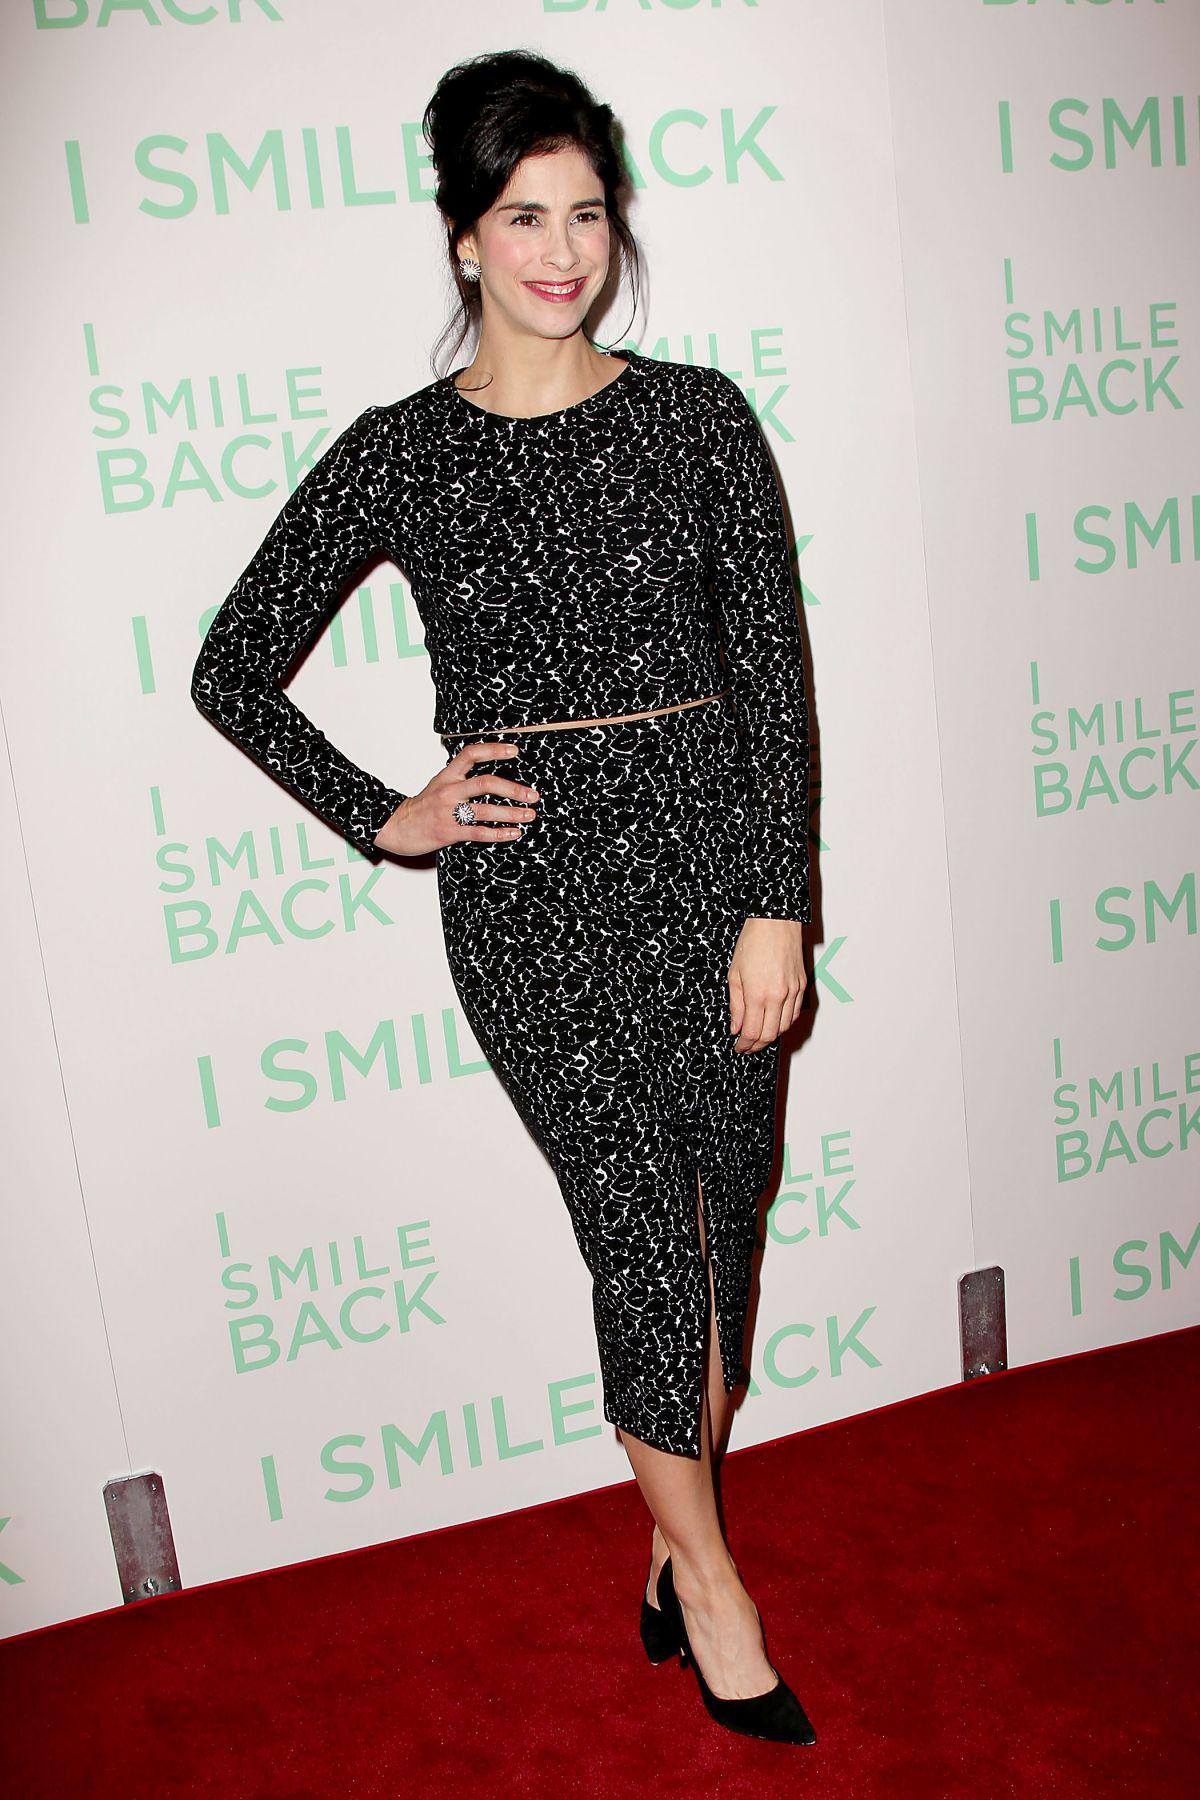 Sarah Silverman At I Smile Back Screening In New York 10